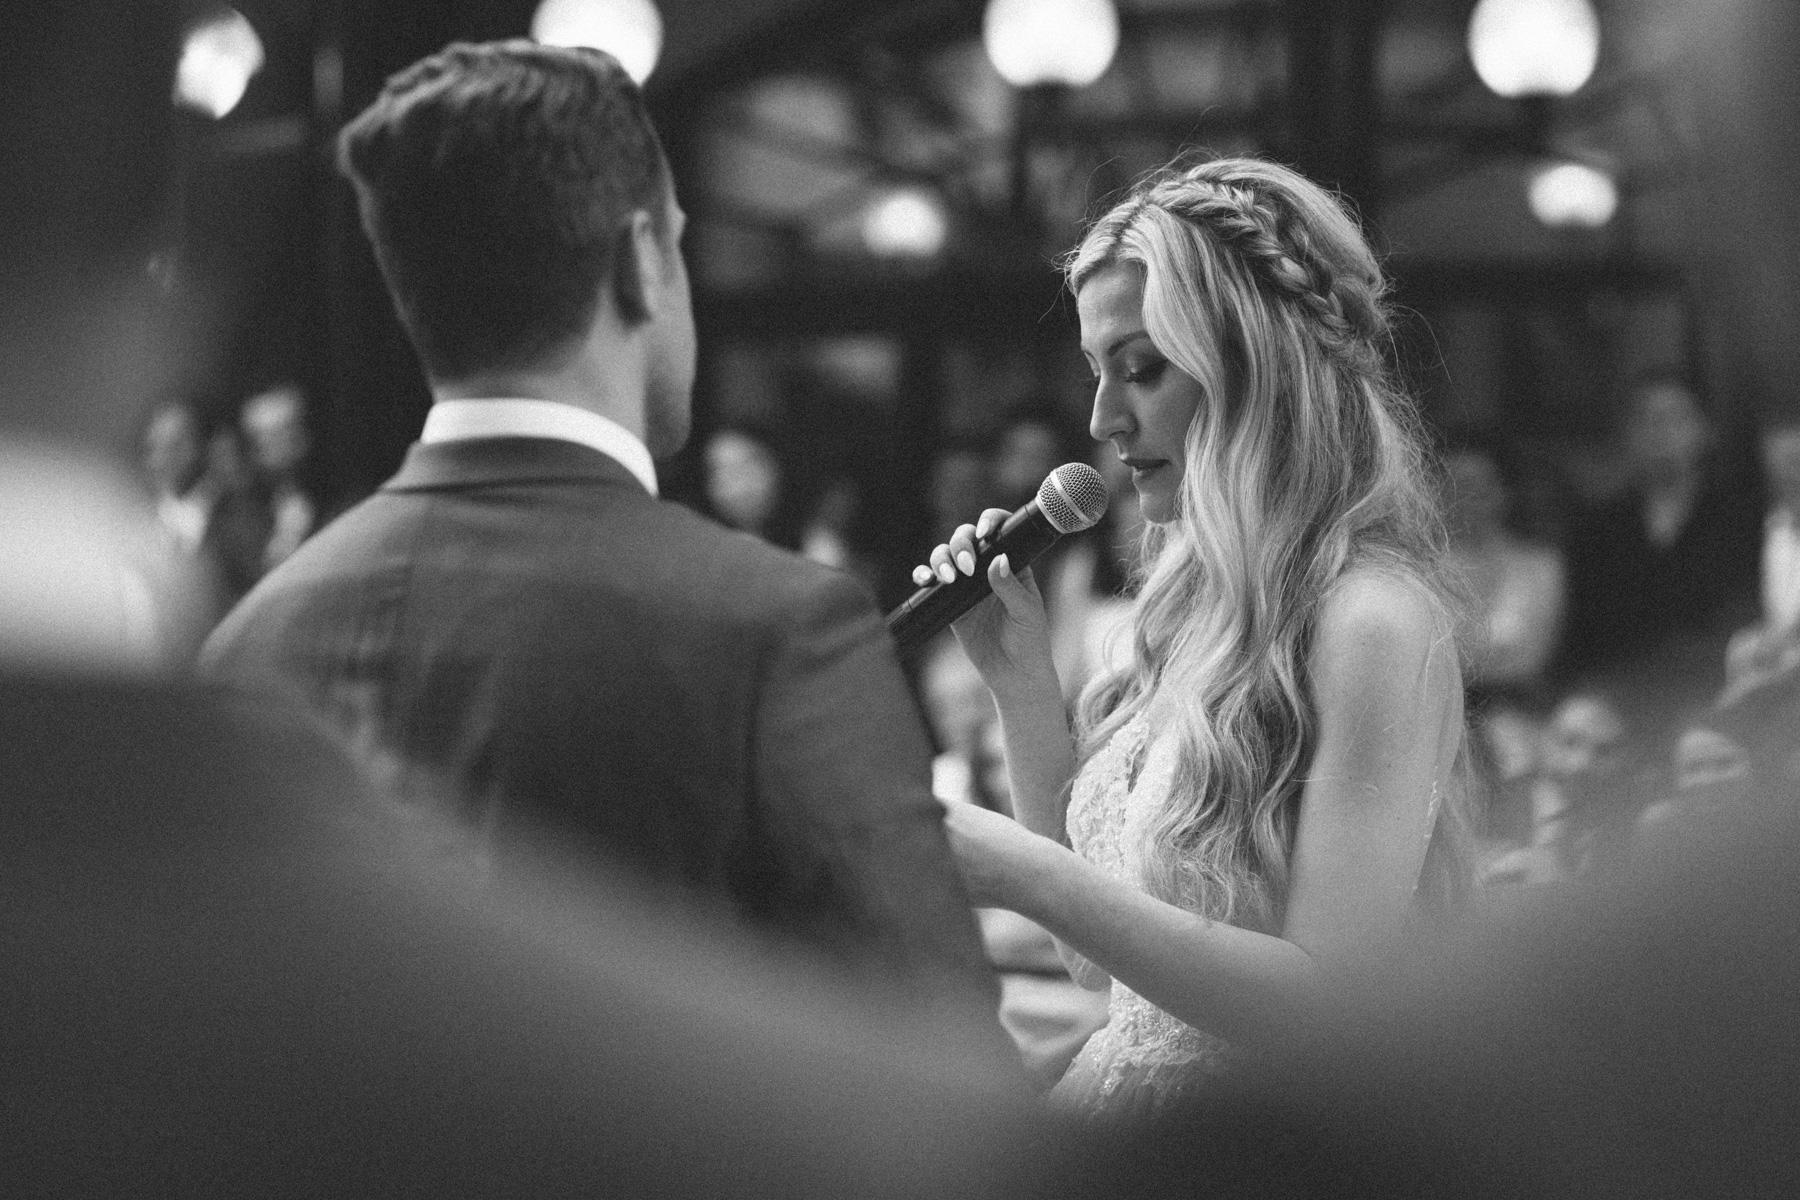 La-Maquette-wedding-by-Toronto-modern-wedding-photographer-Sam-Wong_29.jpg